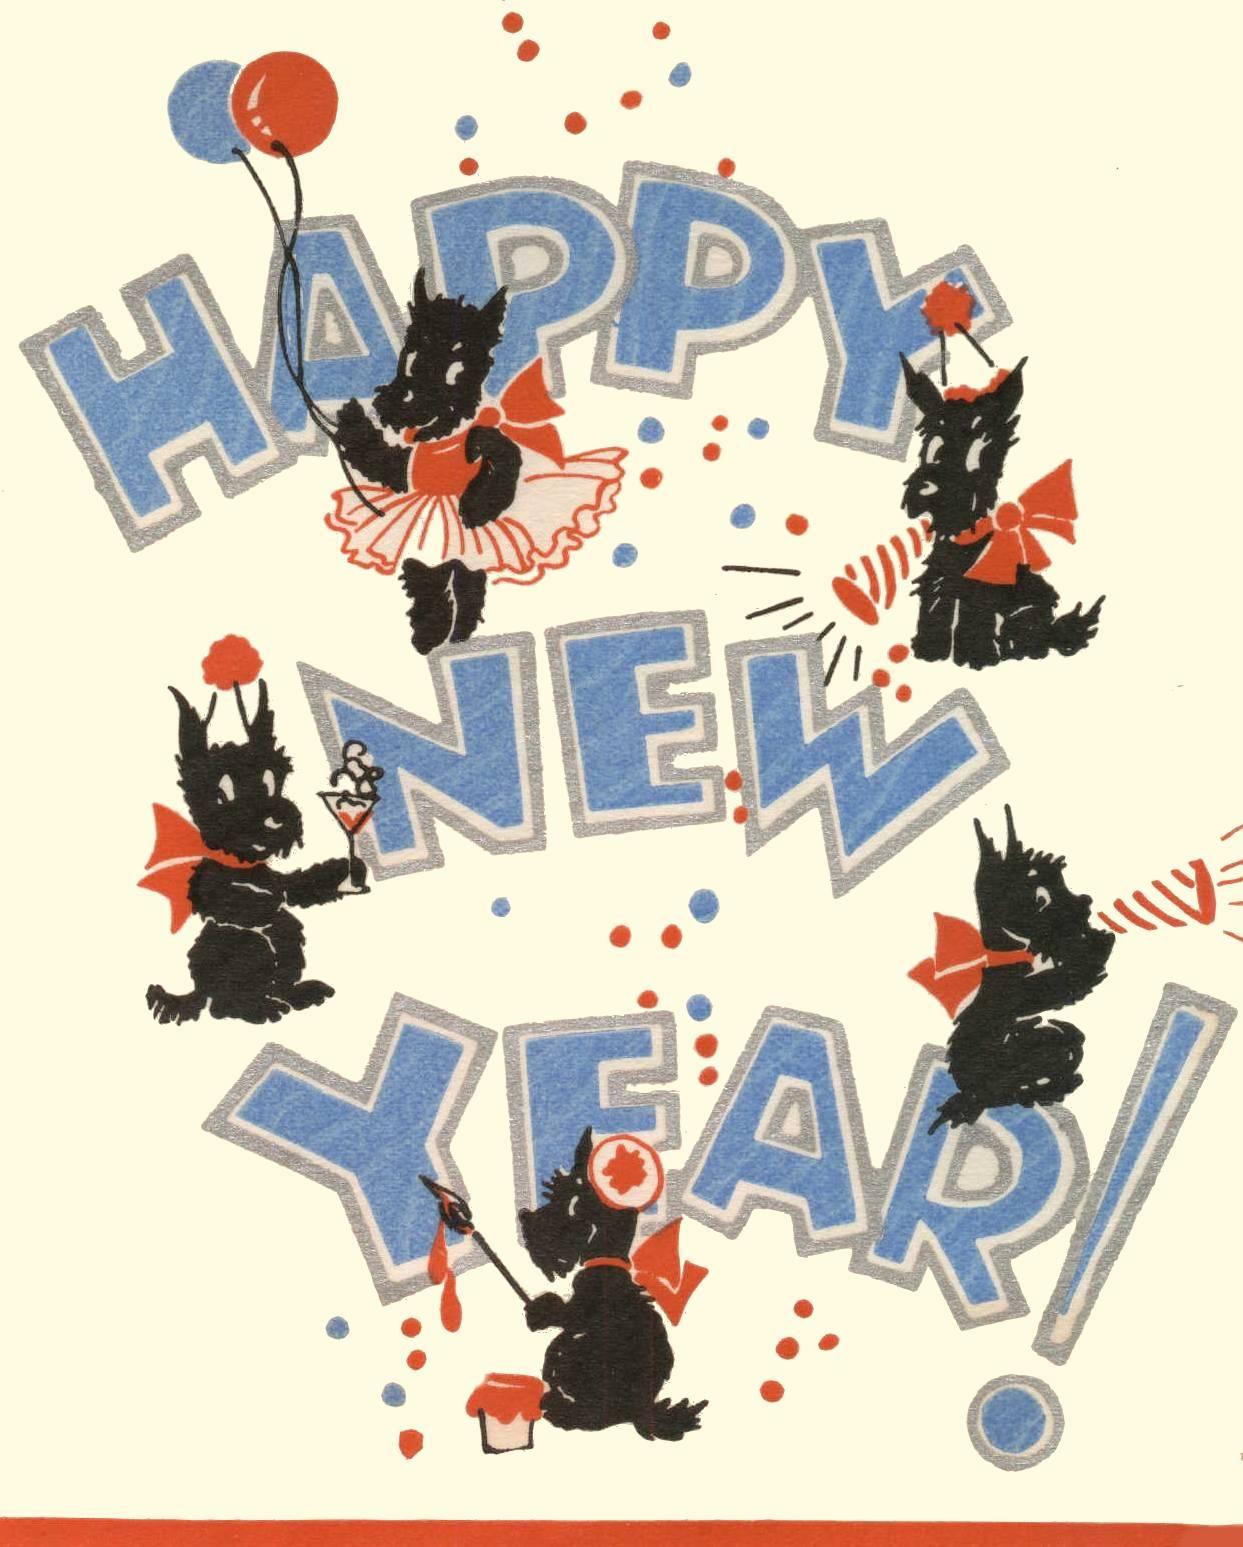 Vintage Scottie Card Vintage happy new year, Happy new